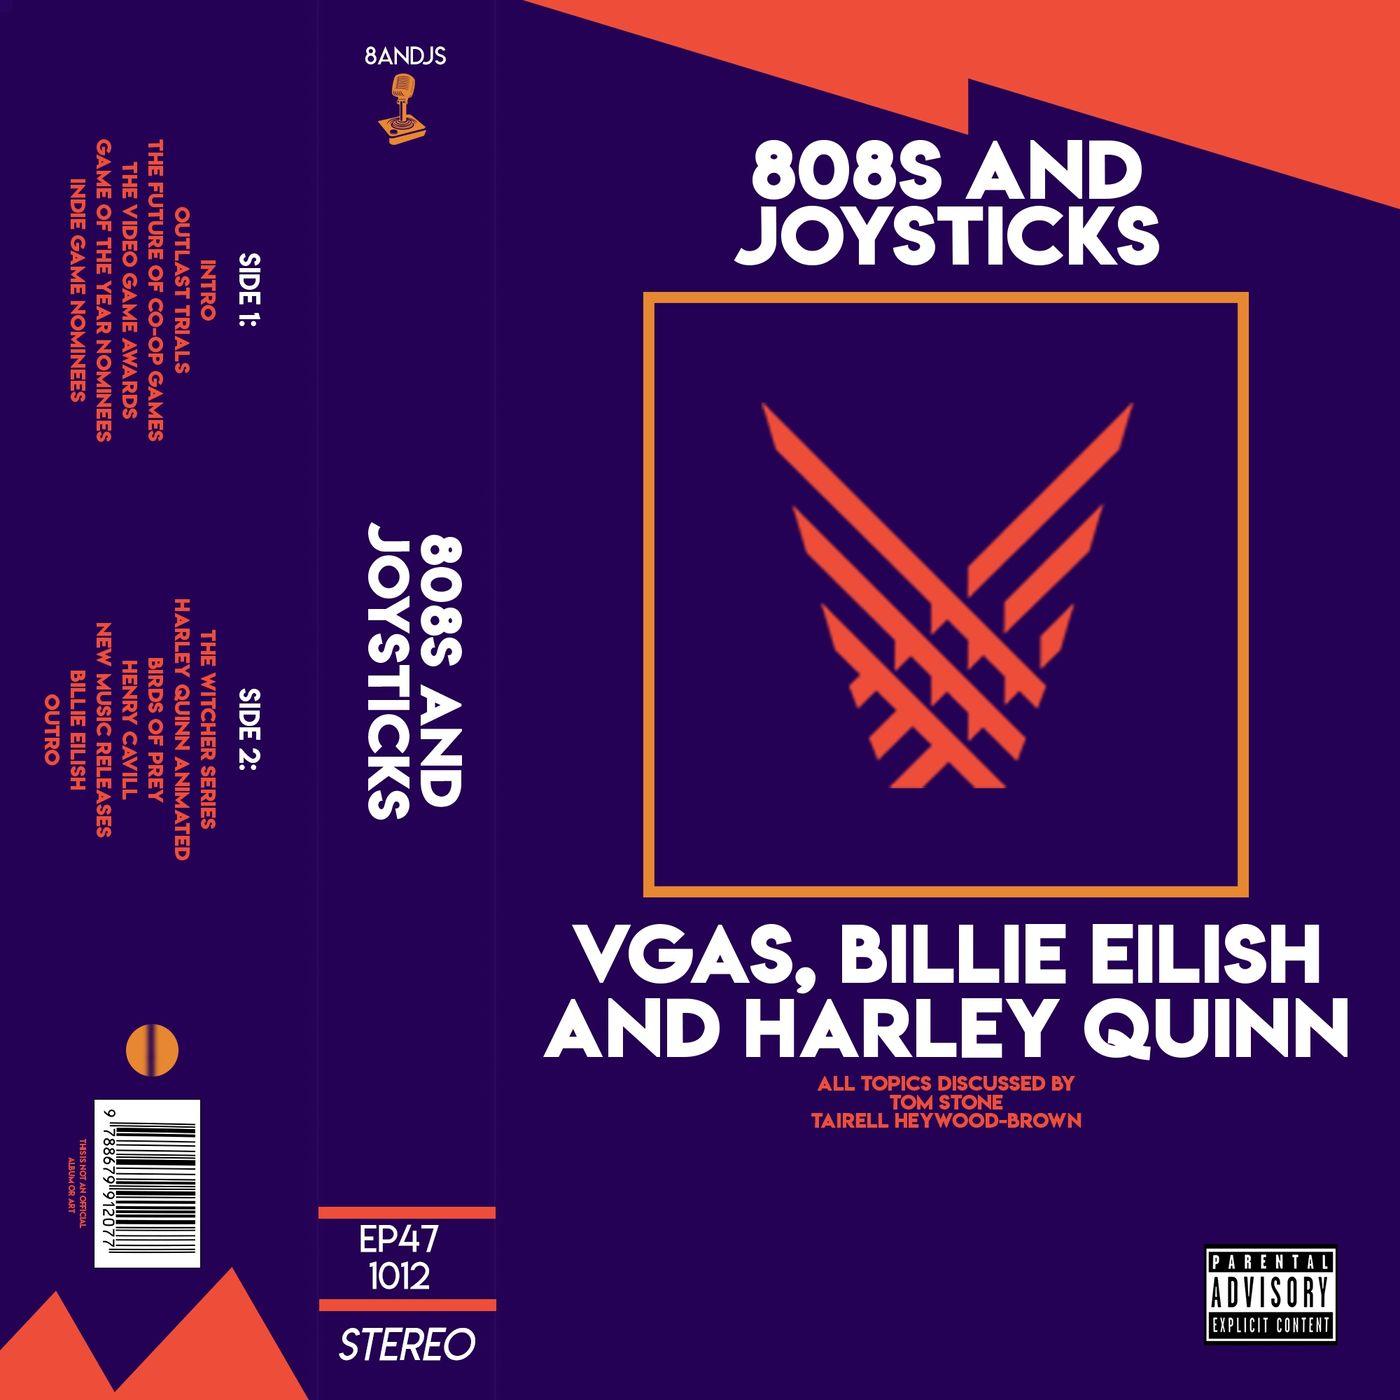 Episode 47: VGAs, Billie Eilish and Harley Quinn